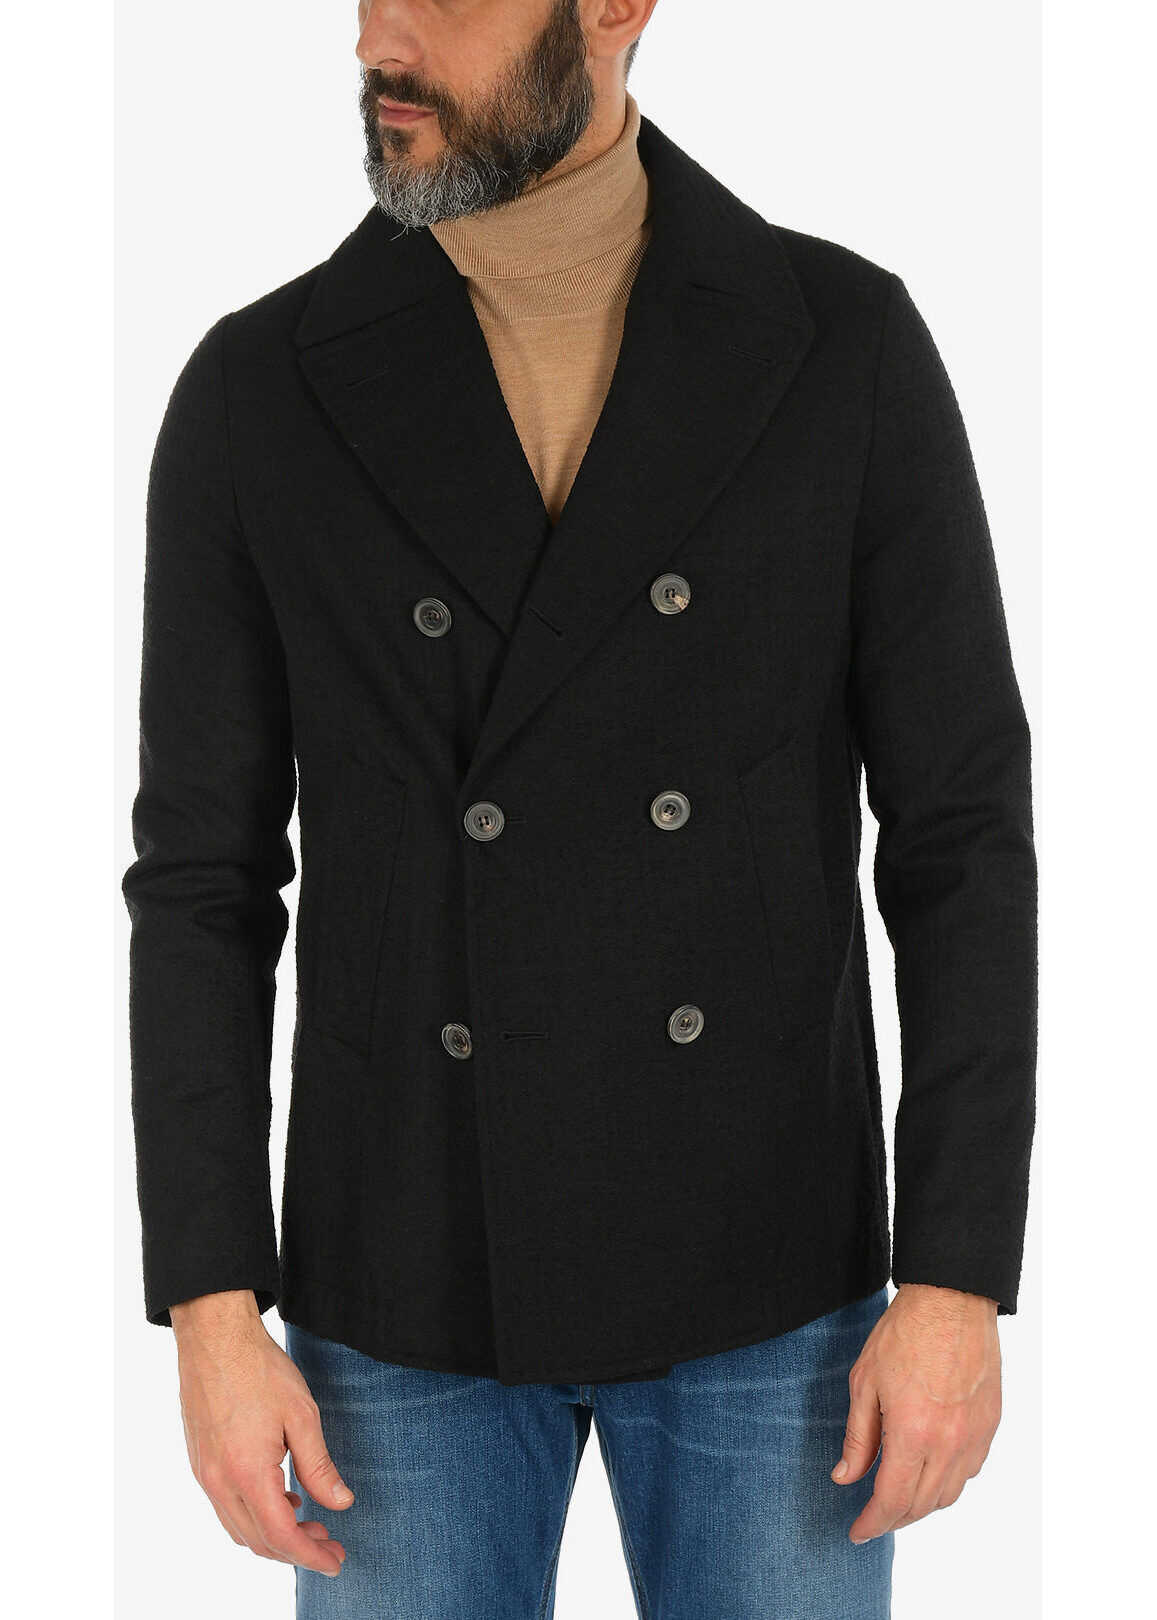 CORNELIANI double breasted Chesterfield coat BLACK imagine